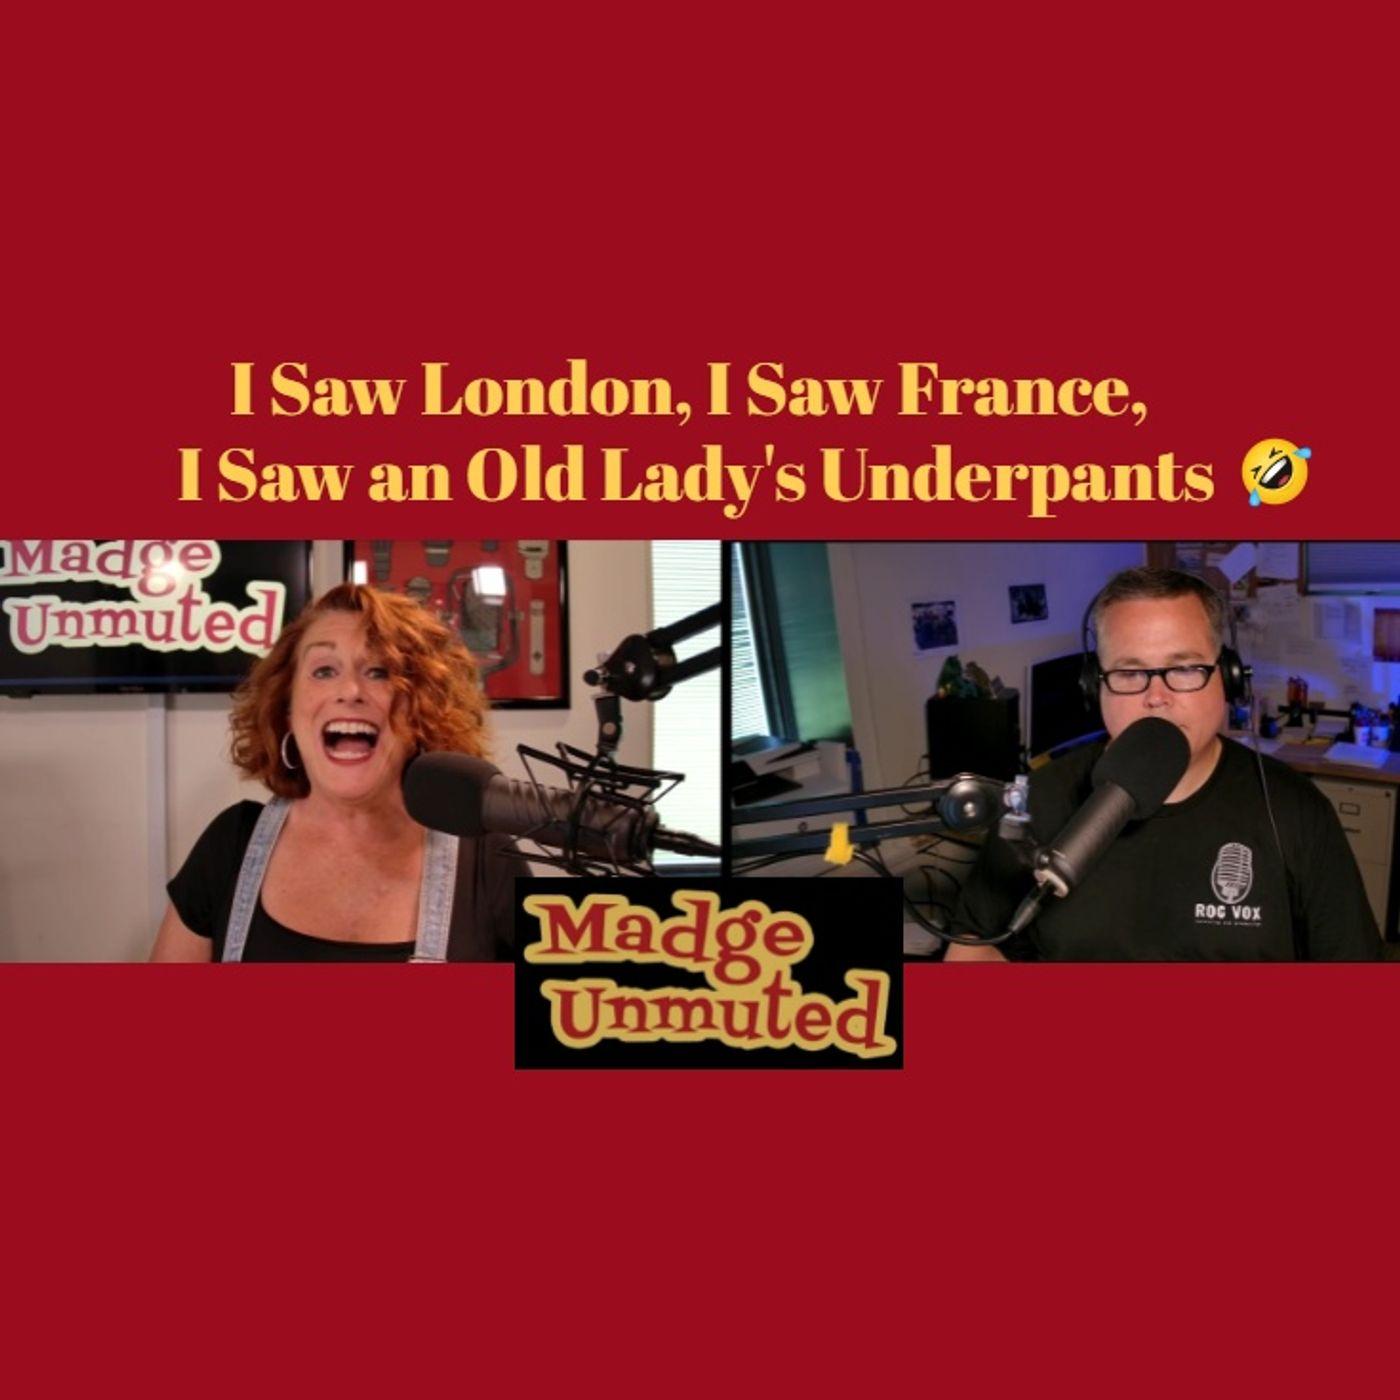 I Saw London, I Saw France, I Saw an Old Lady's Underpants